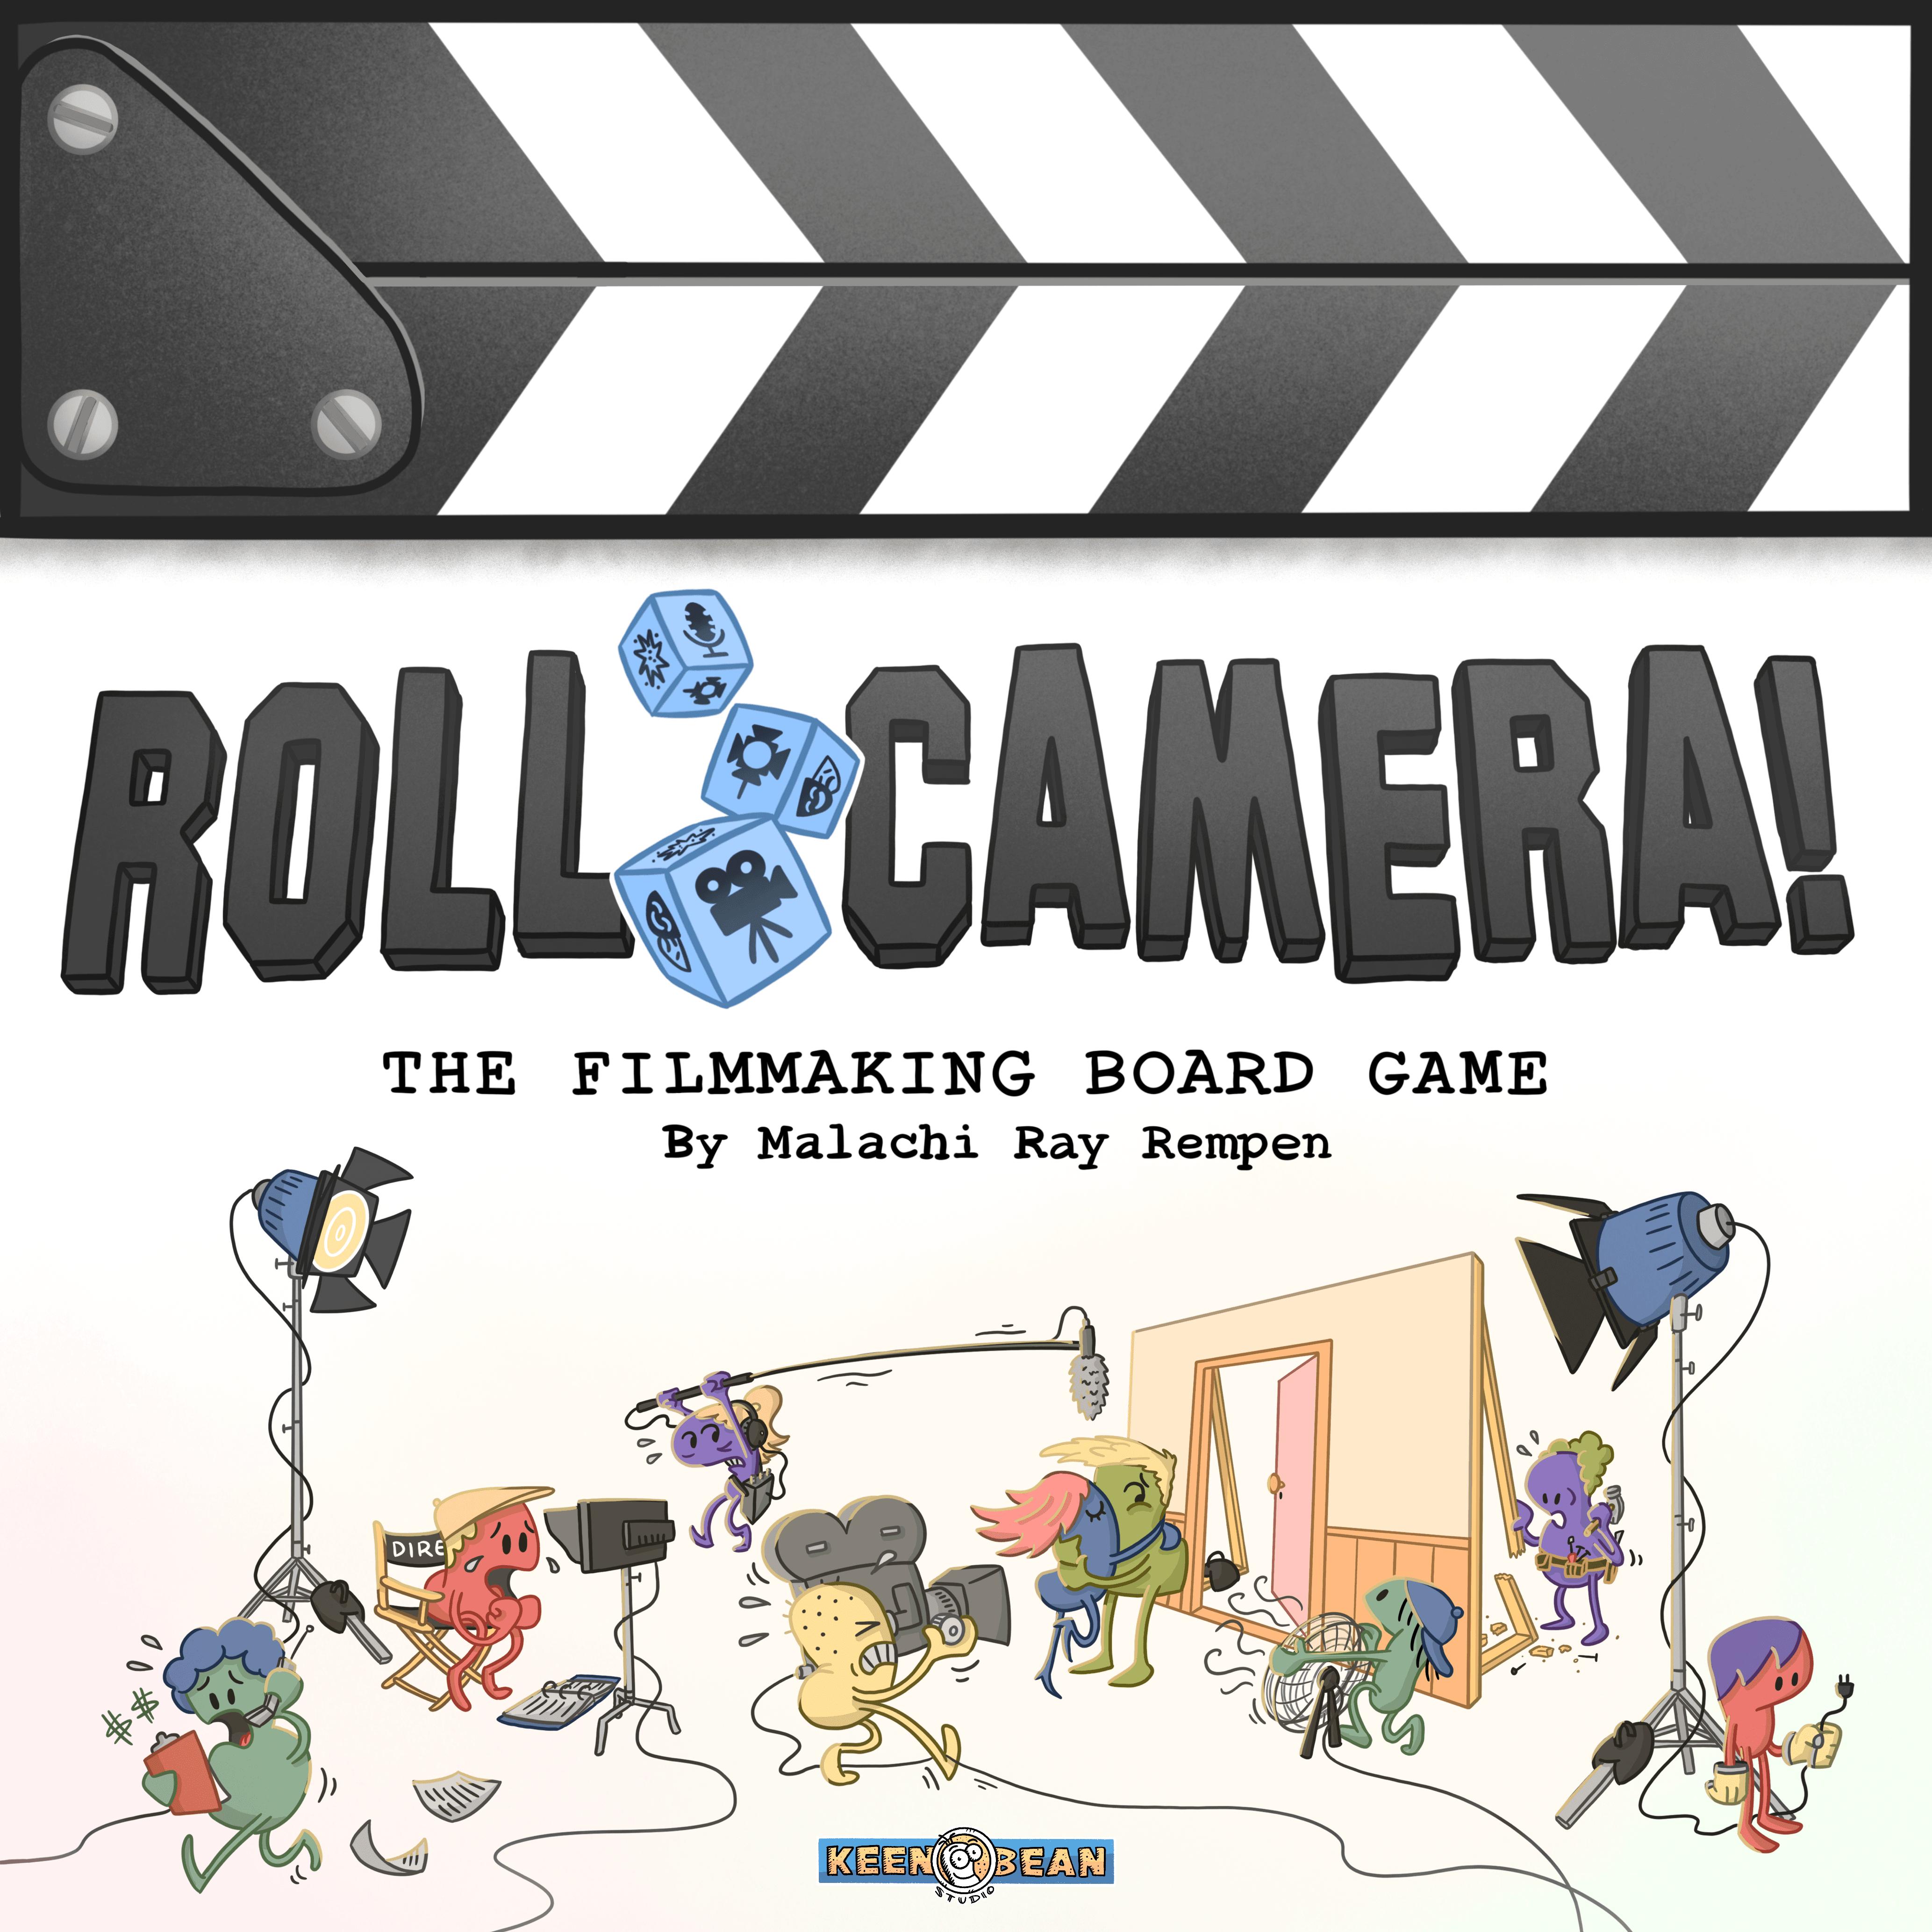 настольная игра Roll Camera!: The Filmmaking Board Game